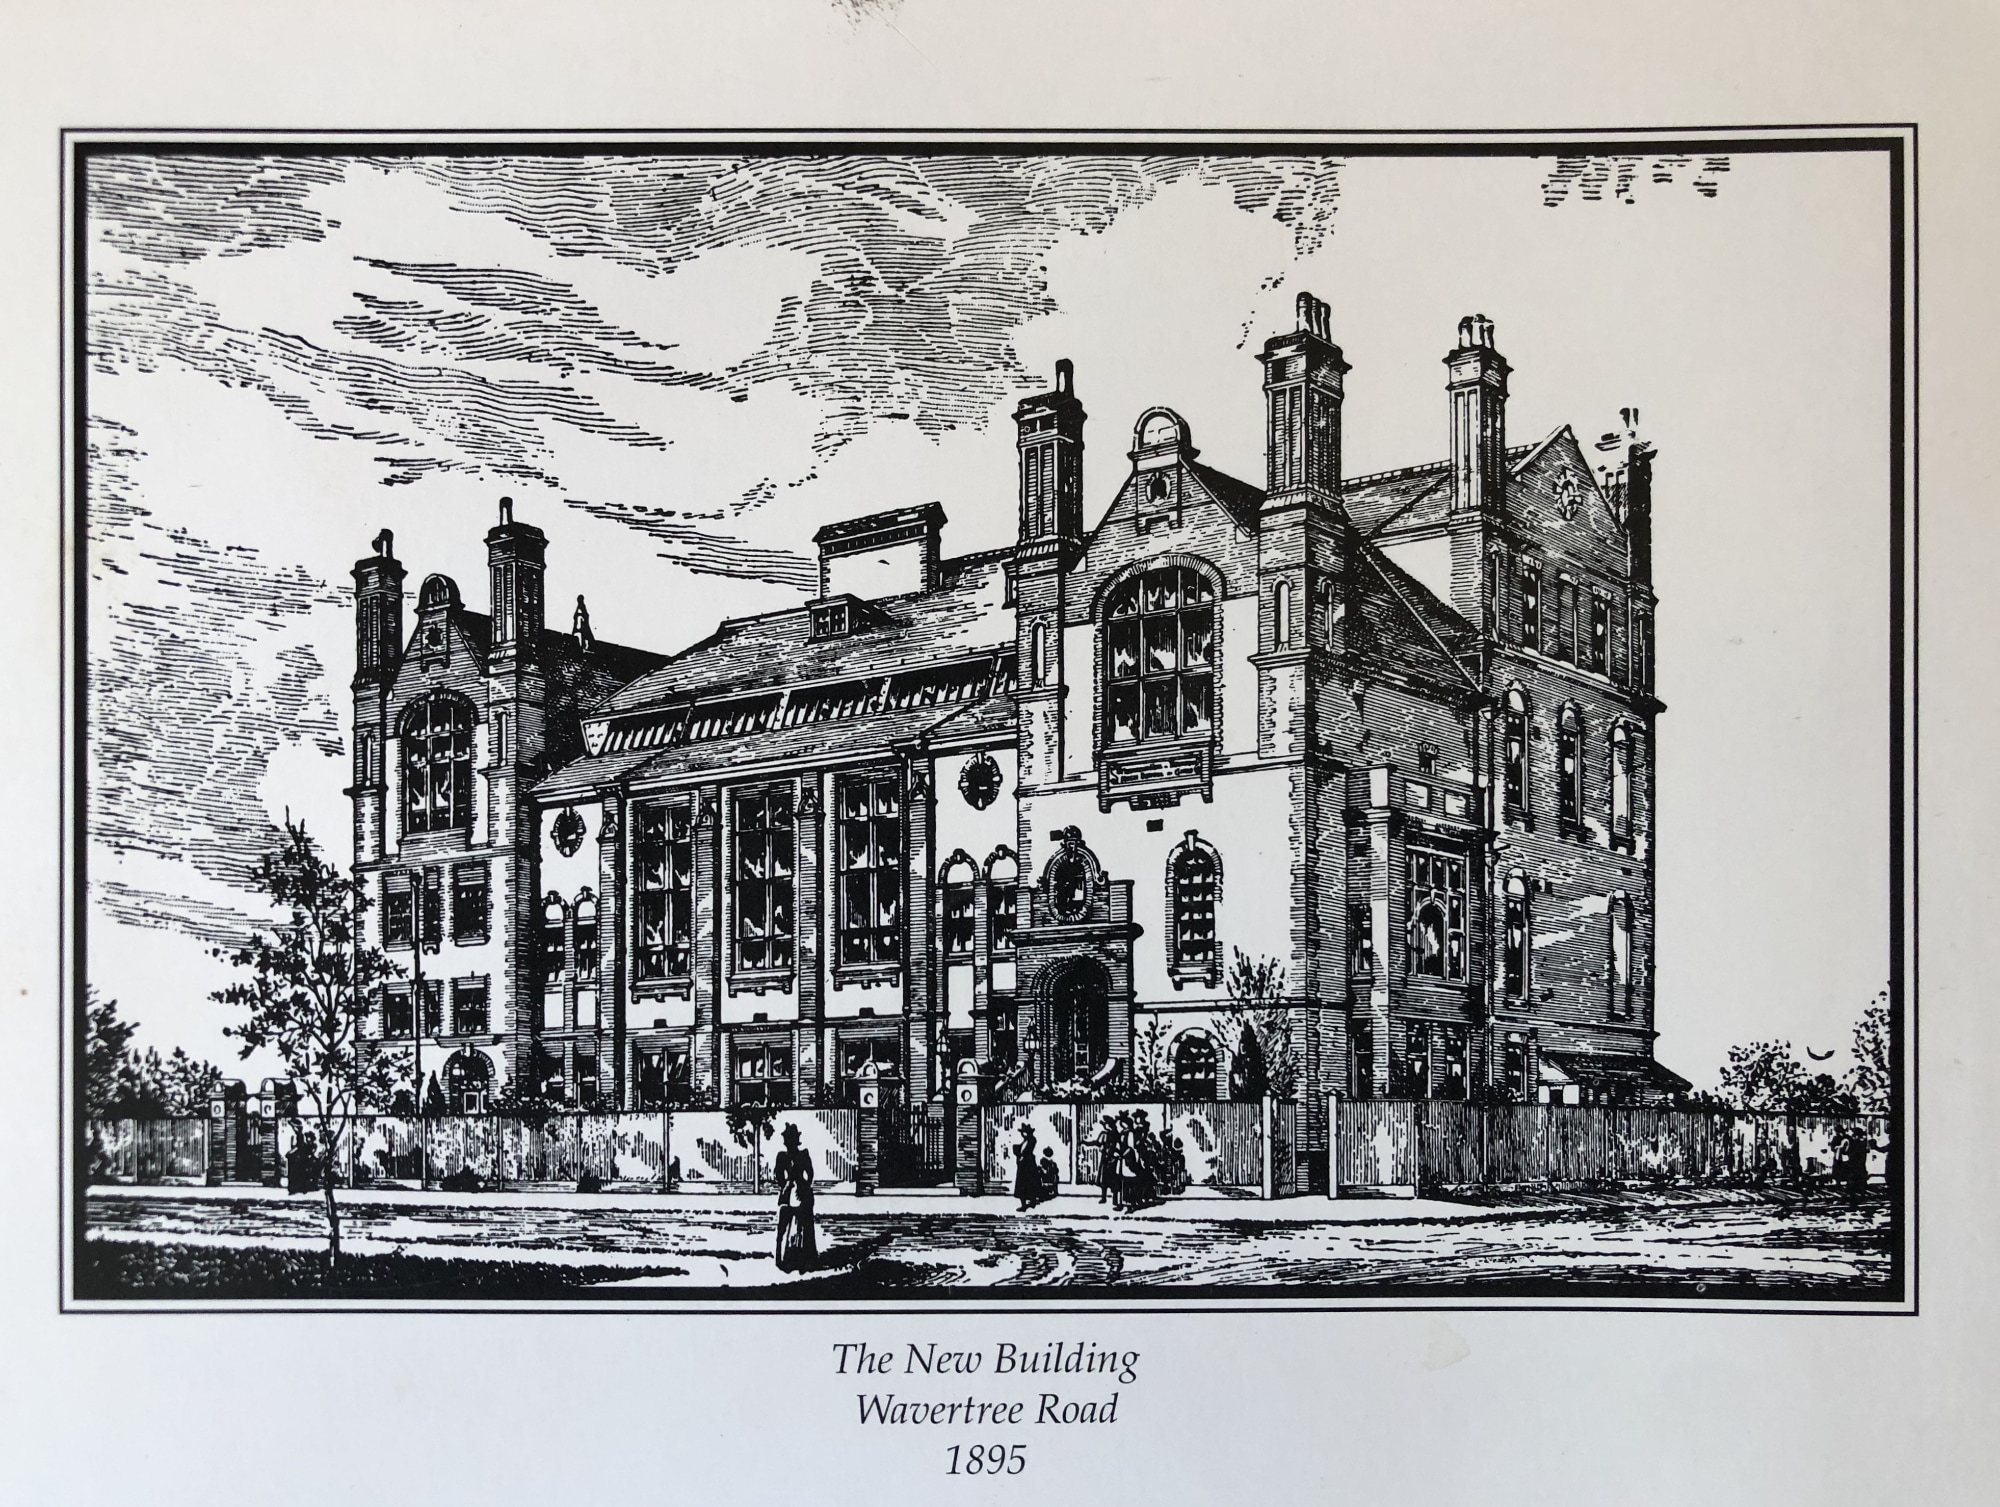 Streatham And Clapham High School —Wavertree Road, 1895